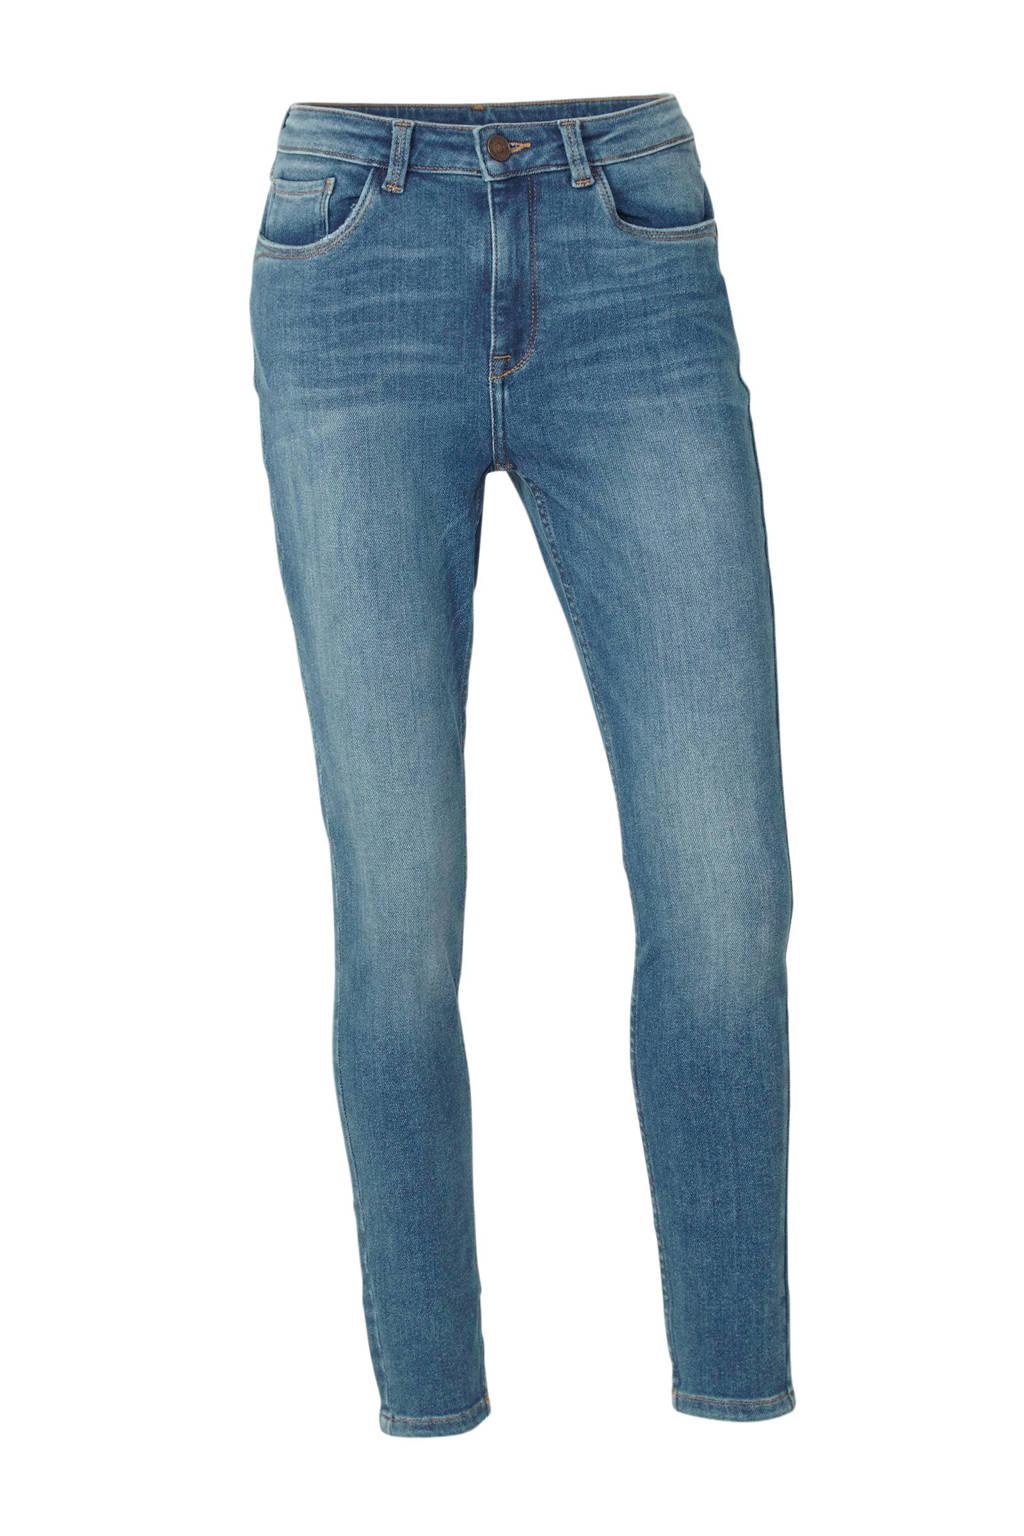 C&A The Denim high waist skinny jeans blauw, Blauw